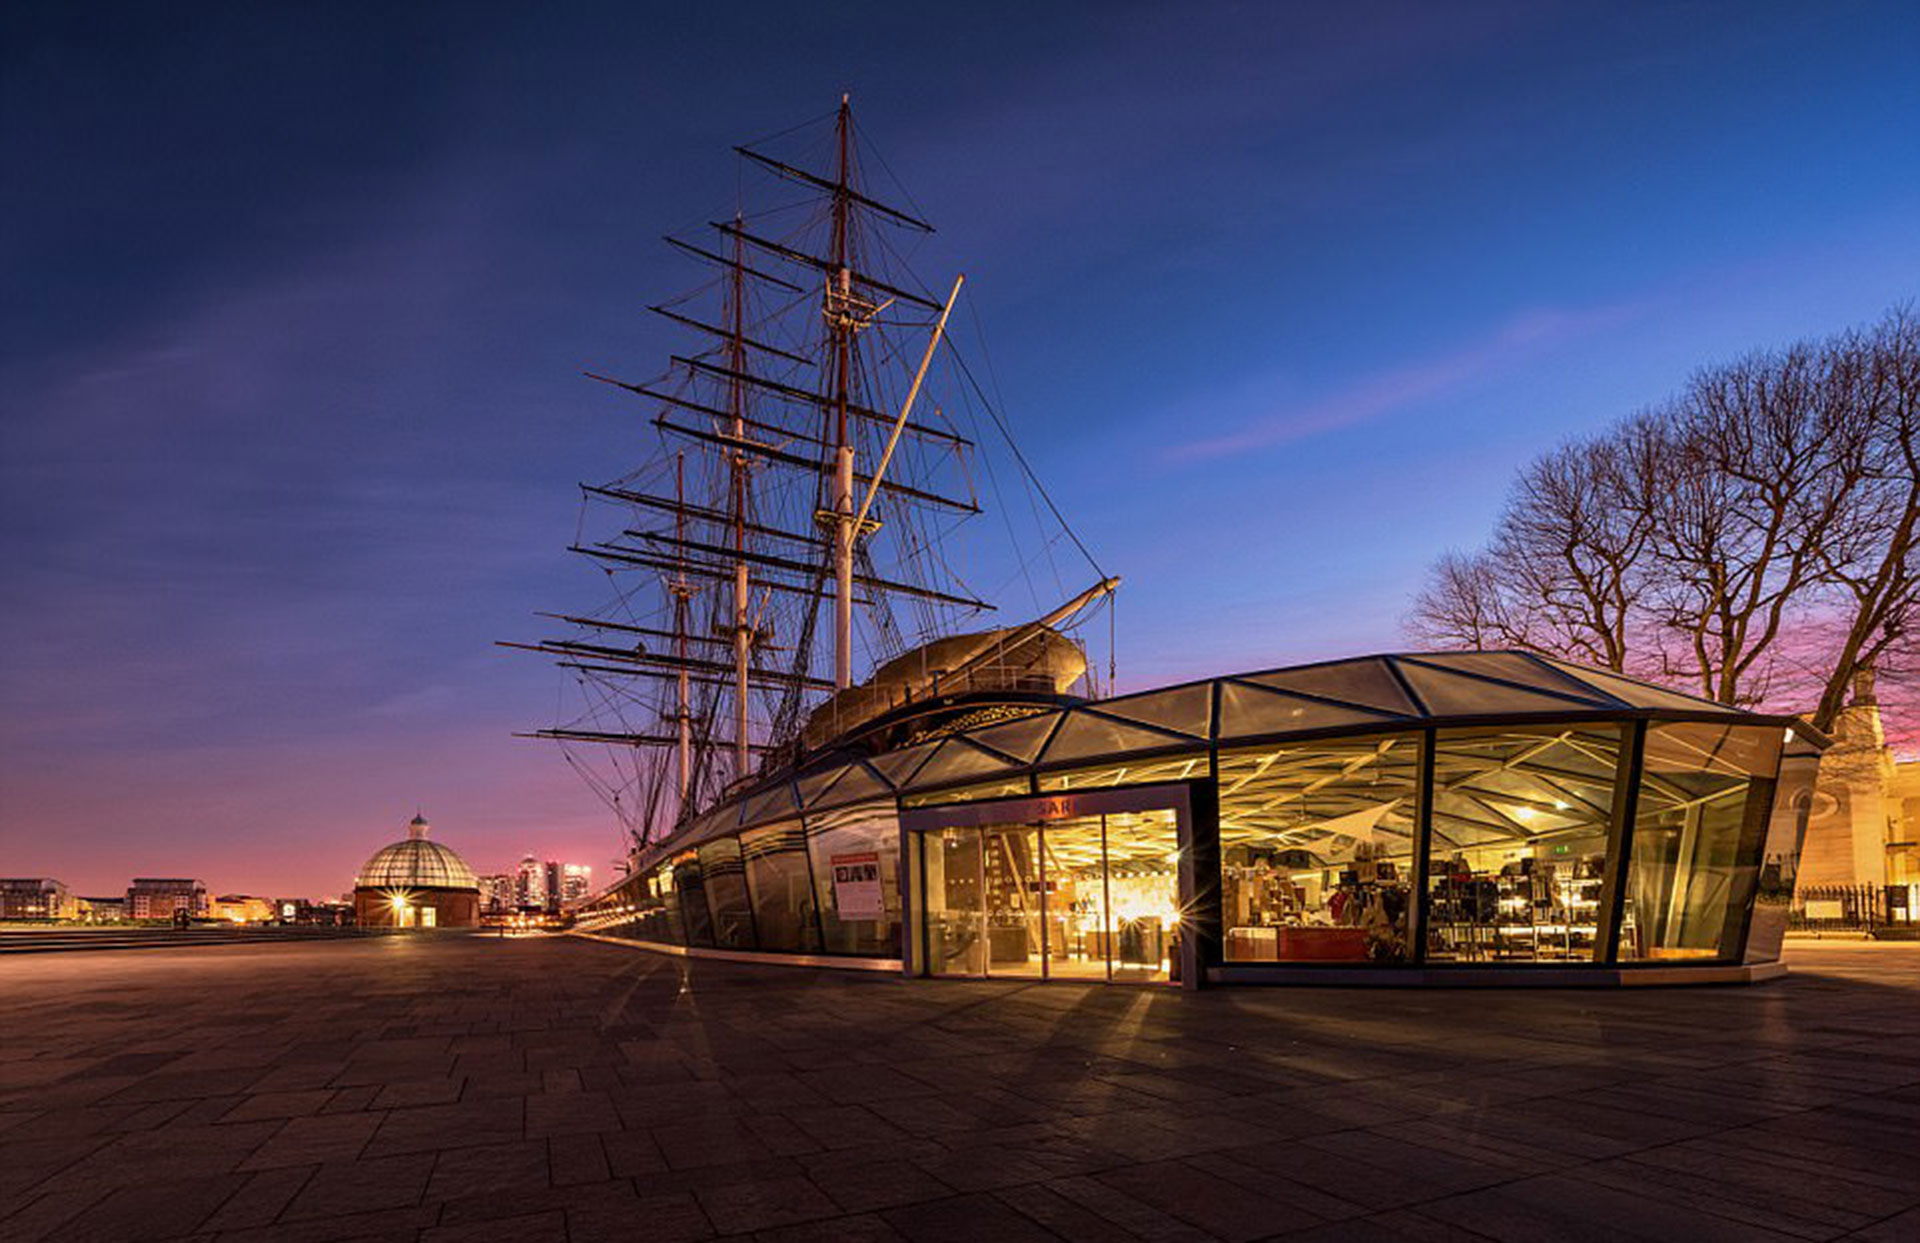 Cutty Sark por Mathew Browne. Se trata de un barco británico construido en 1869 contrastado con la arquitectura moderna